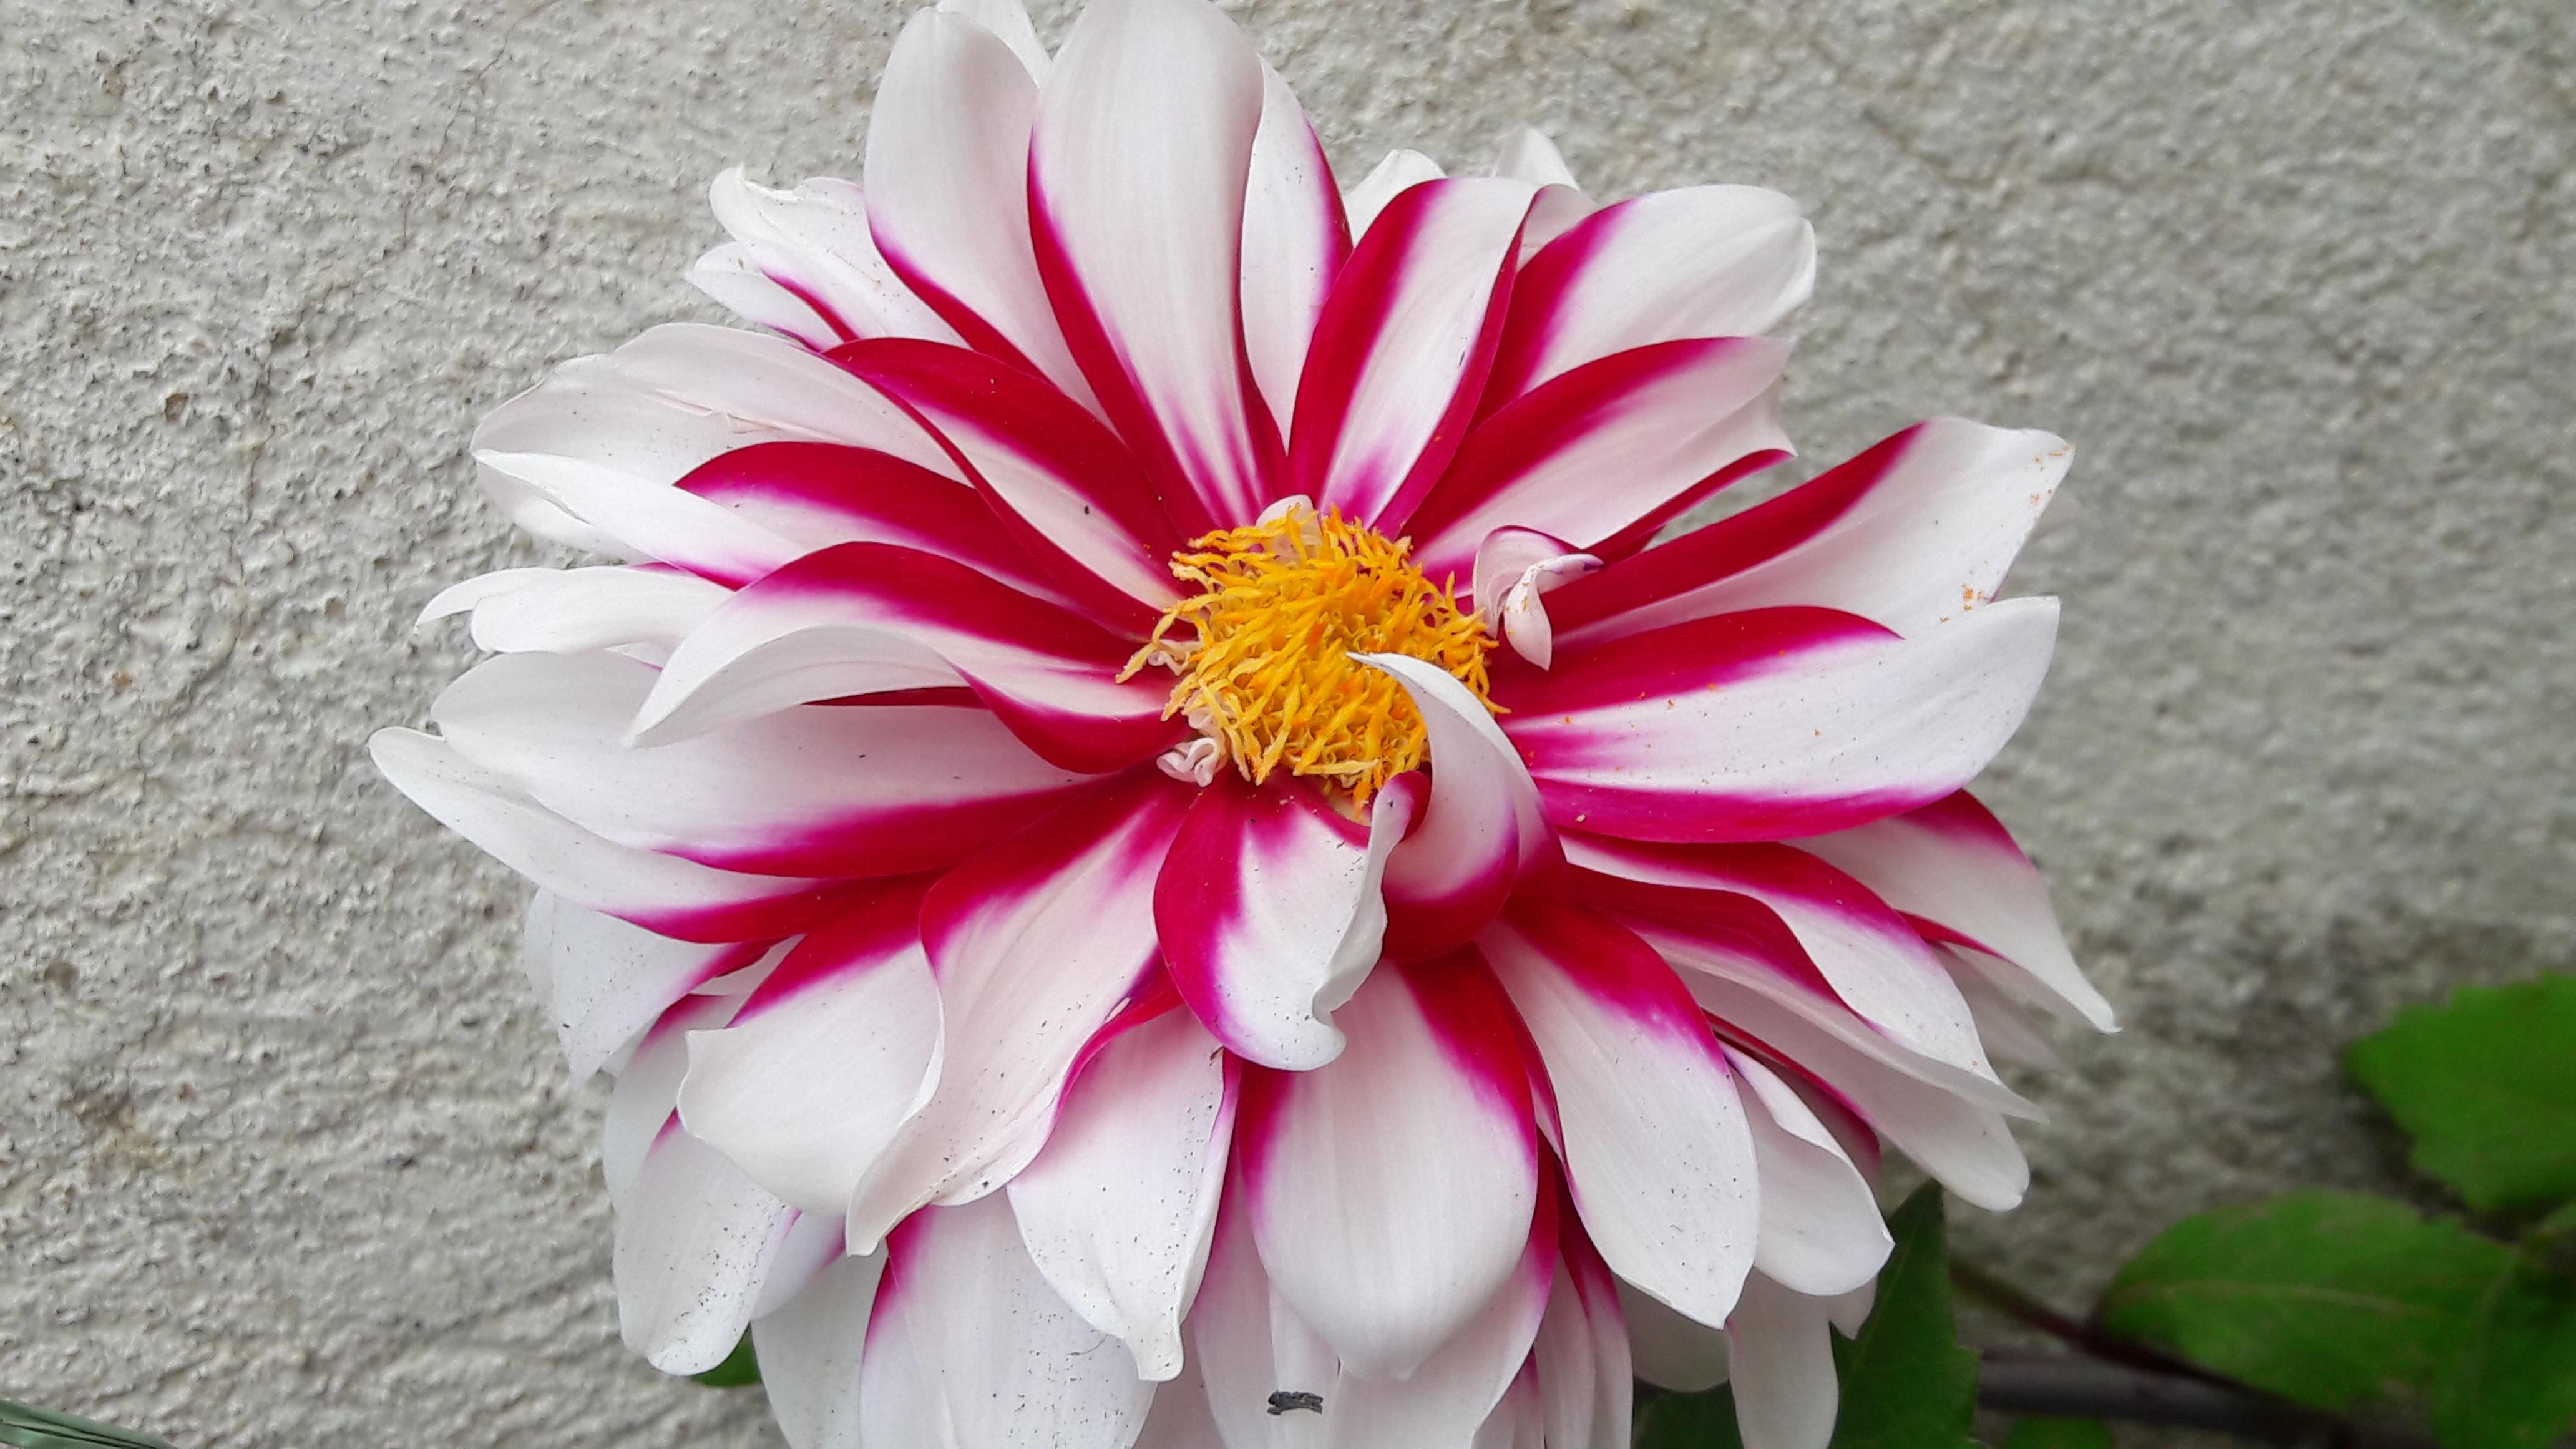 Filewhitish pink dahlia flowerg wikimedia commons filewhitish pink dahlia flowerg izmirmasajfo